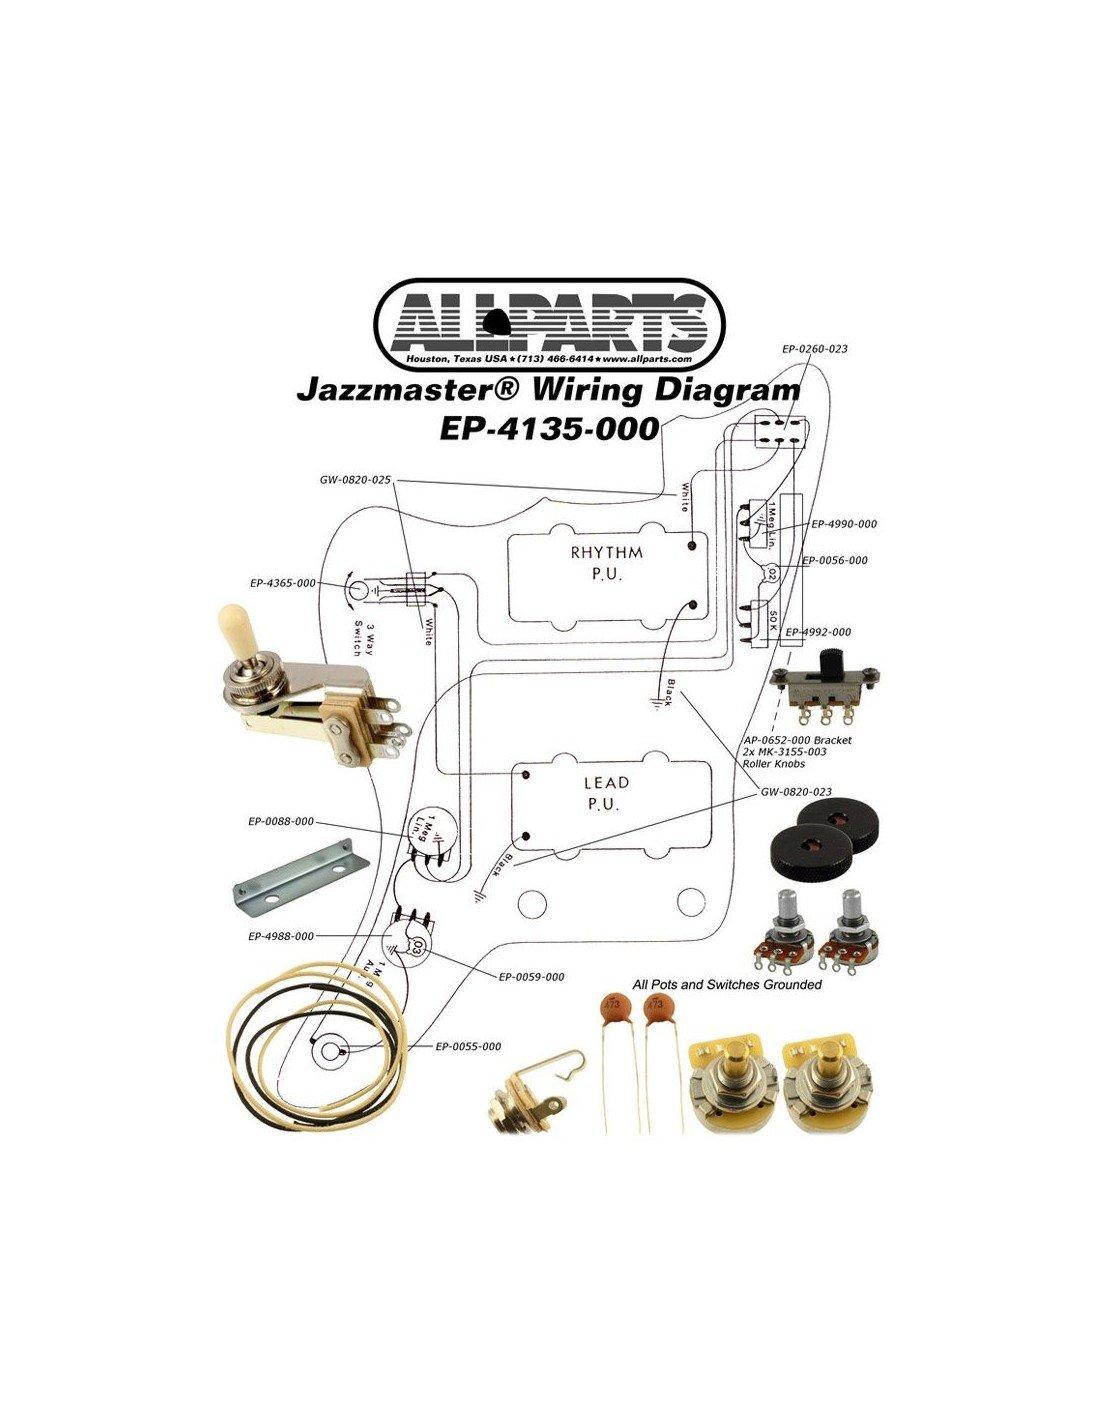 Comprar Allparts EP-4135-000 Wiring Kit for Jazzmaster